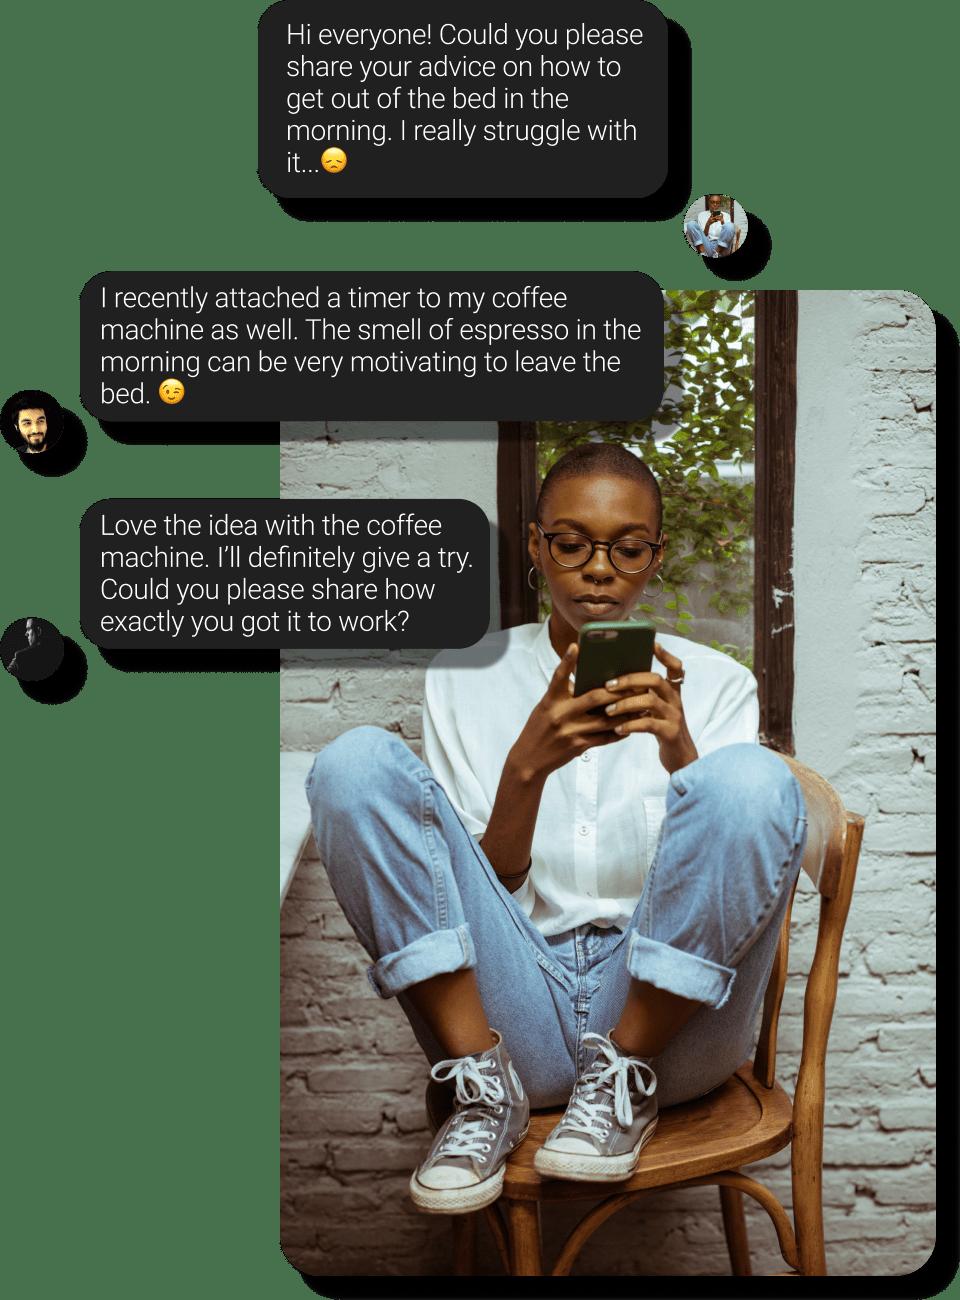 chat visualizations